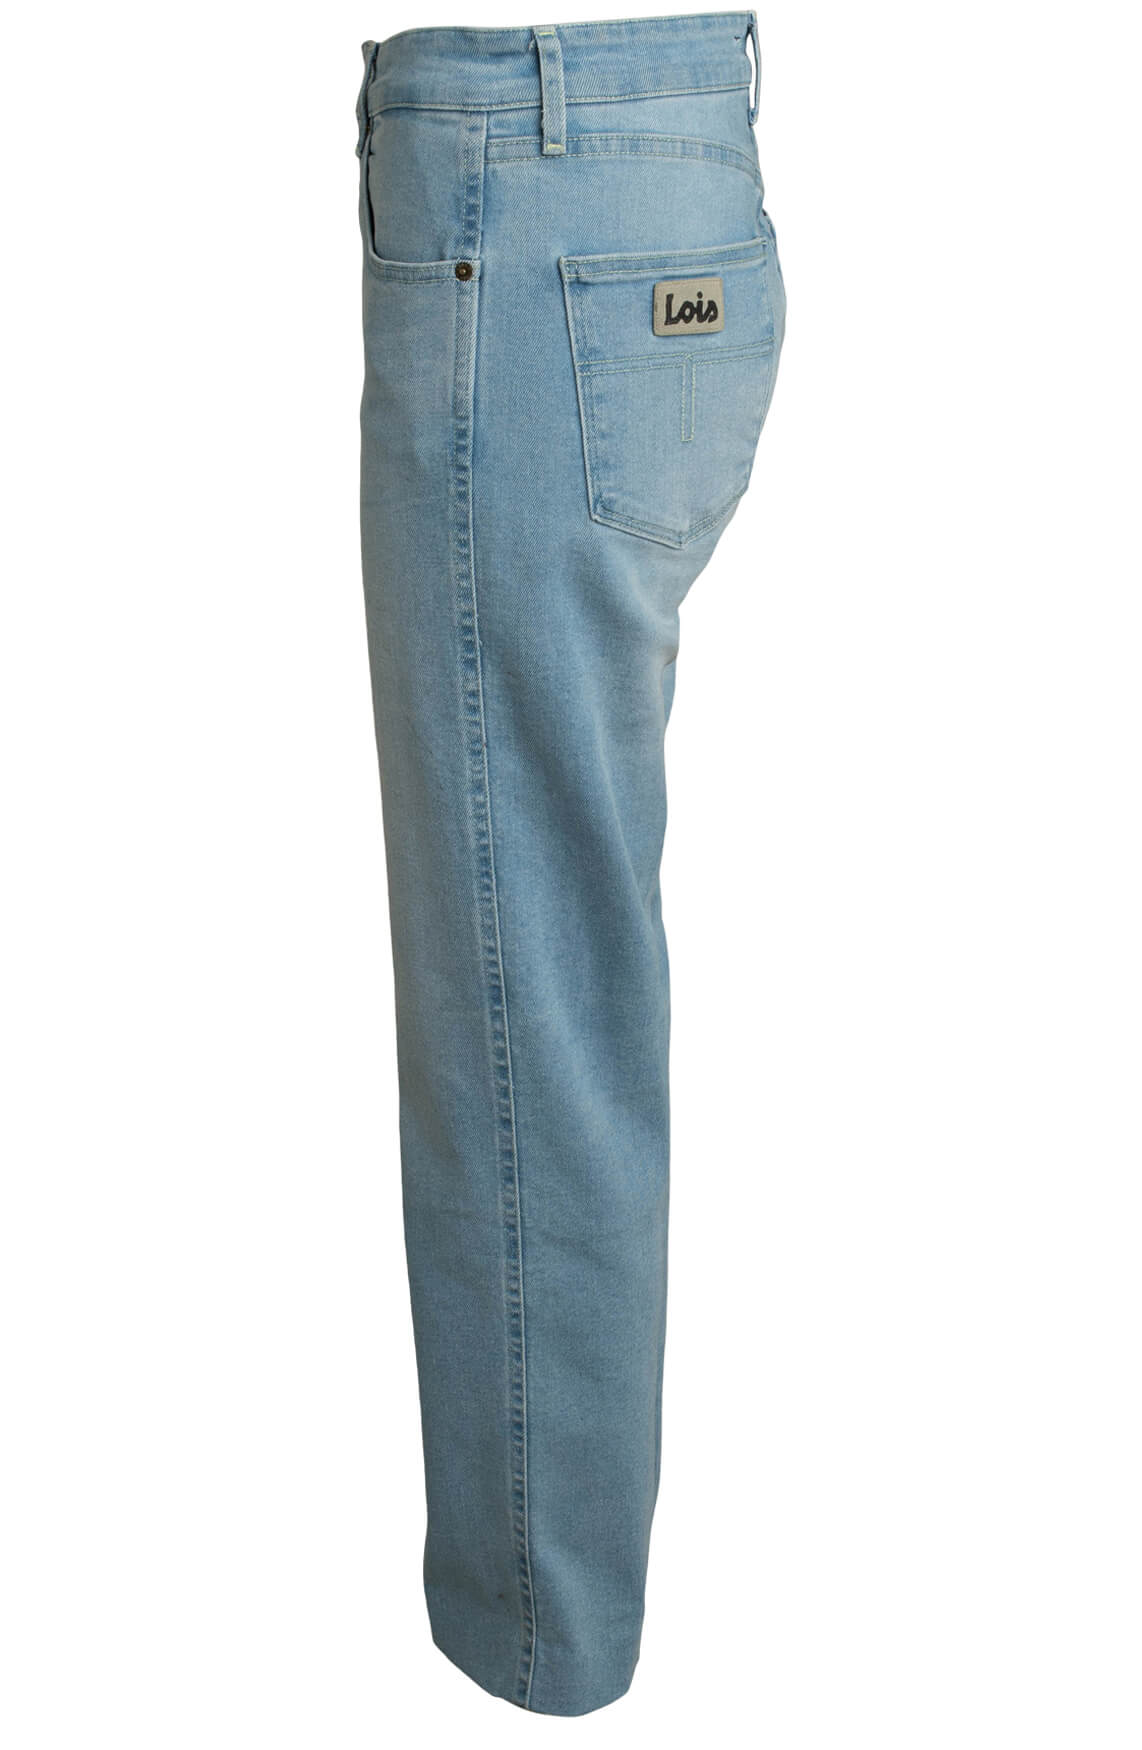 Lois Dames Jeans met hoge taille Blauw